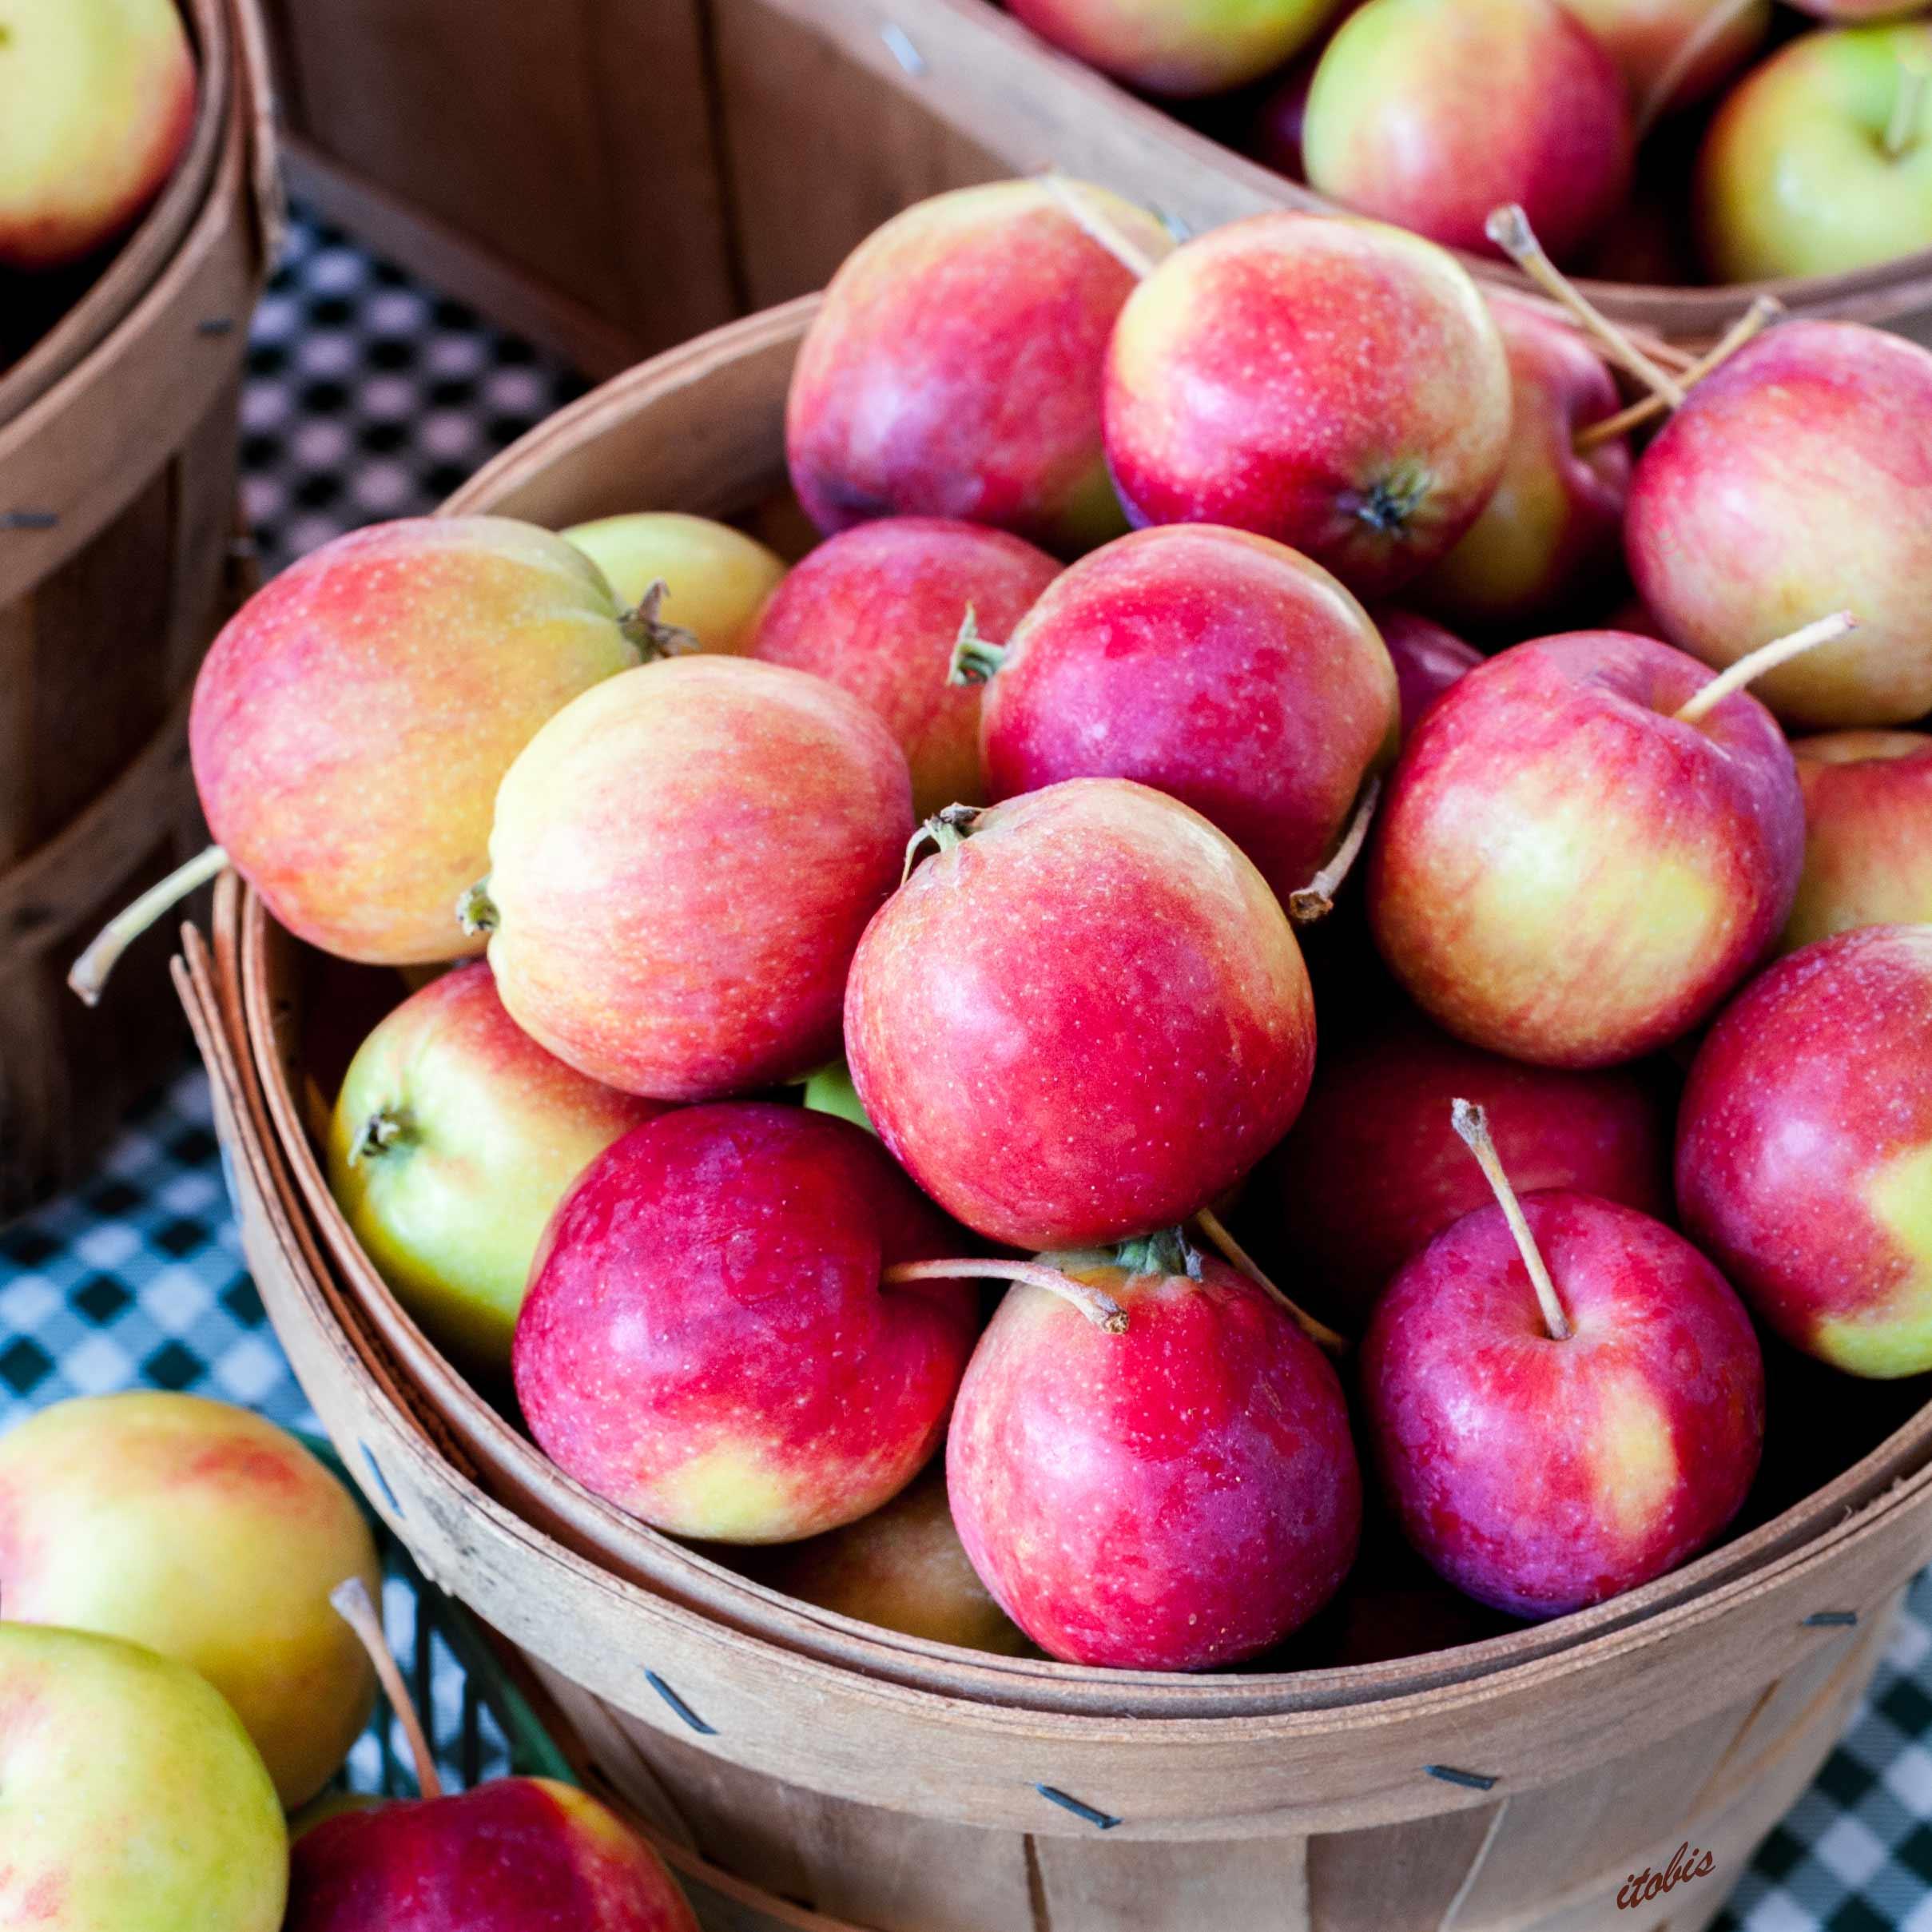 KITCHEN PHOTO BOARD : Crabapples at the Market - Hall's Apple Market - Ottawa Farmers' Market, Lansdowne Park - photo by Irene Tobis